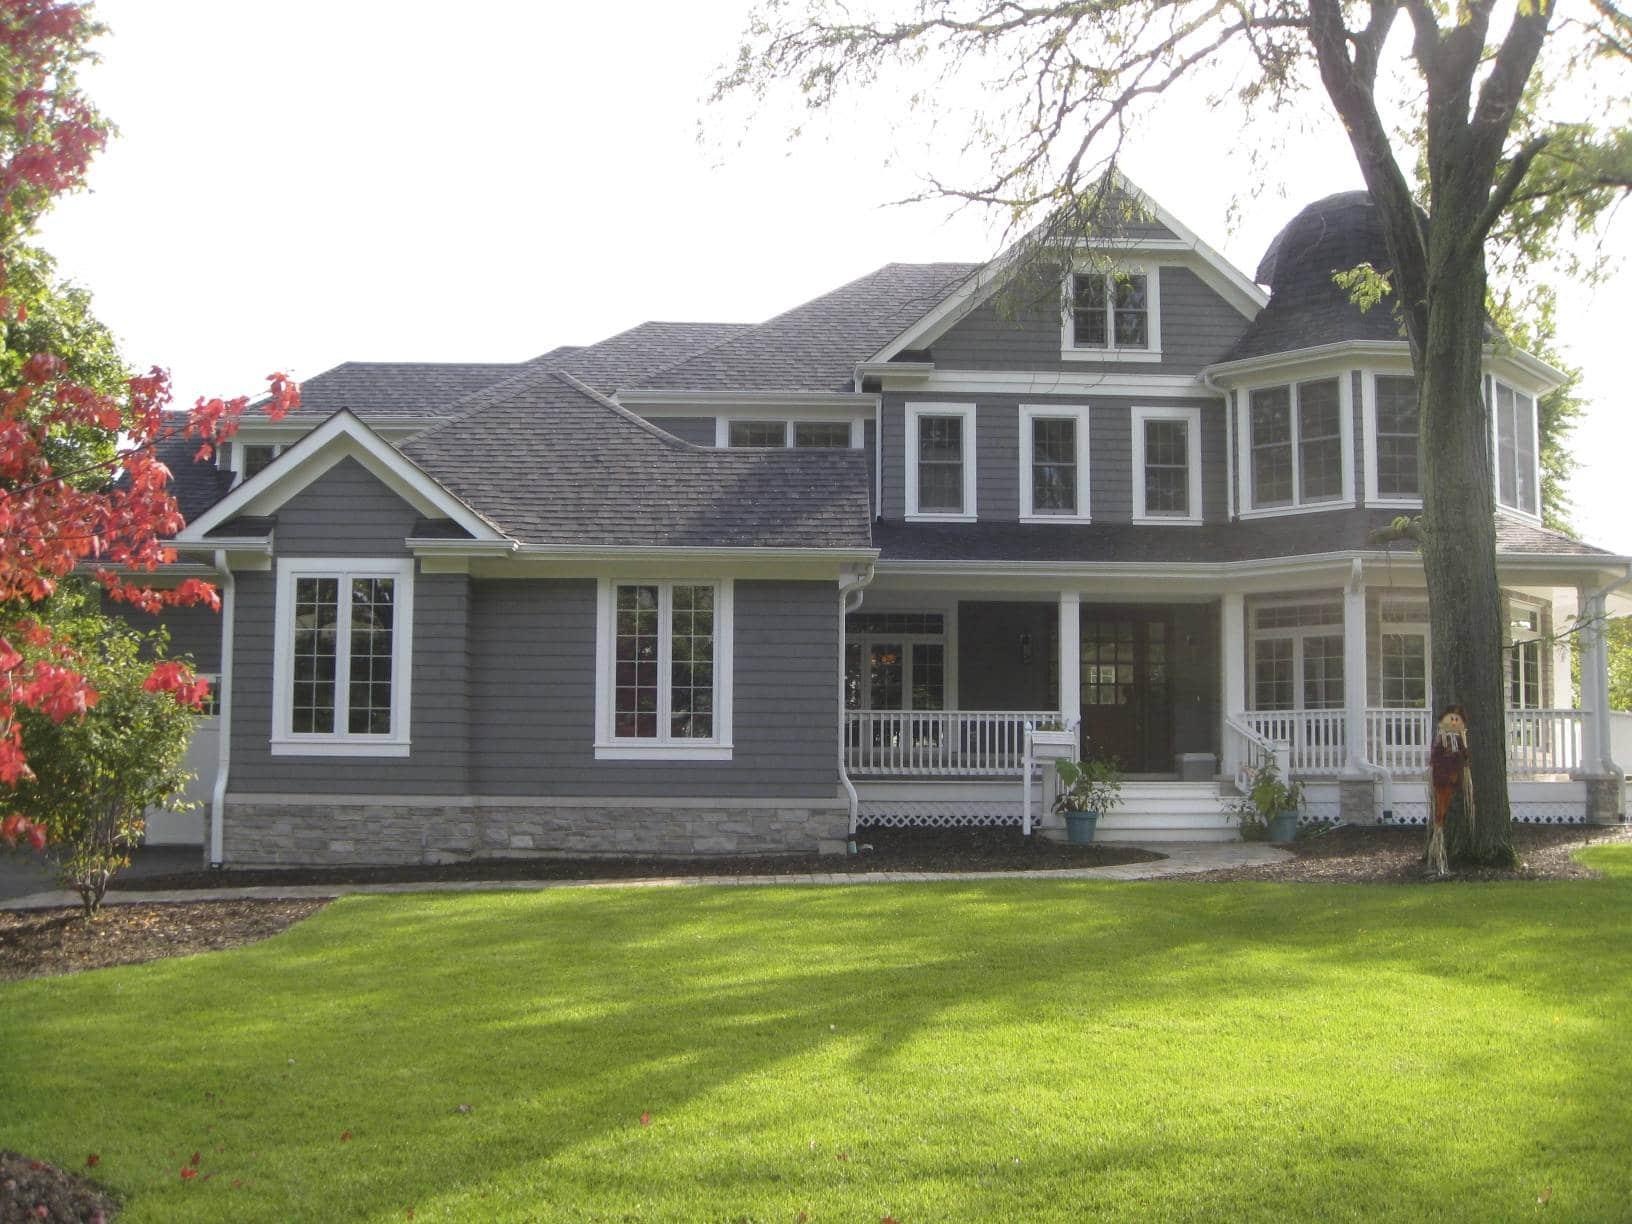 Deerfield coastal style home